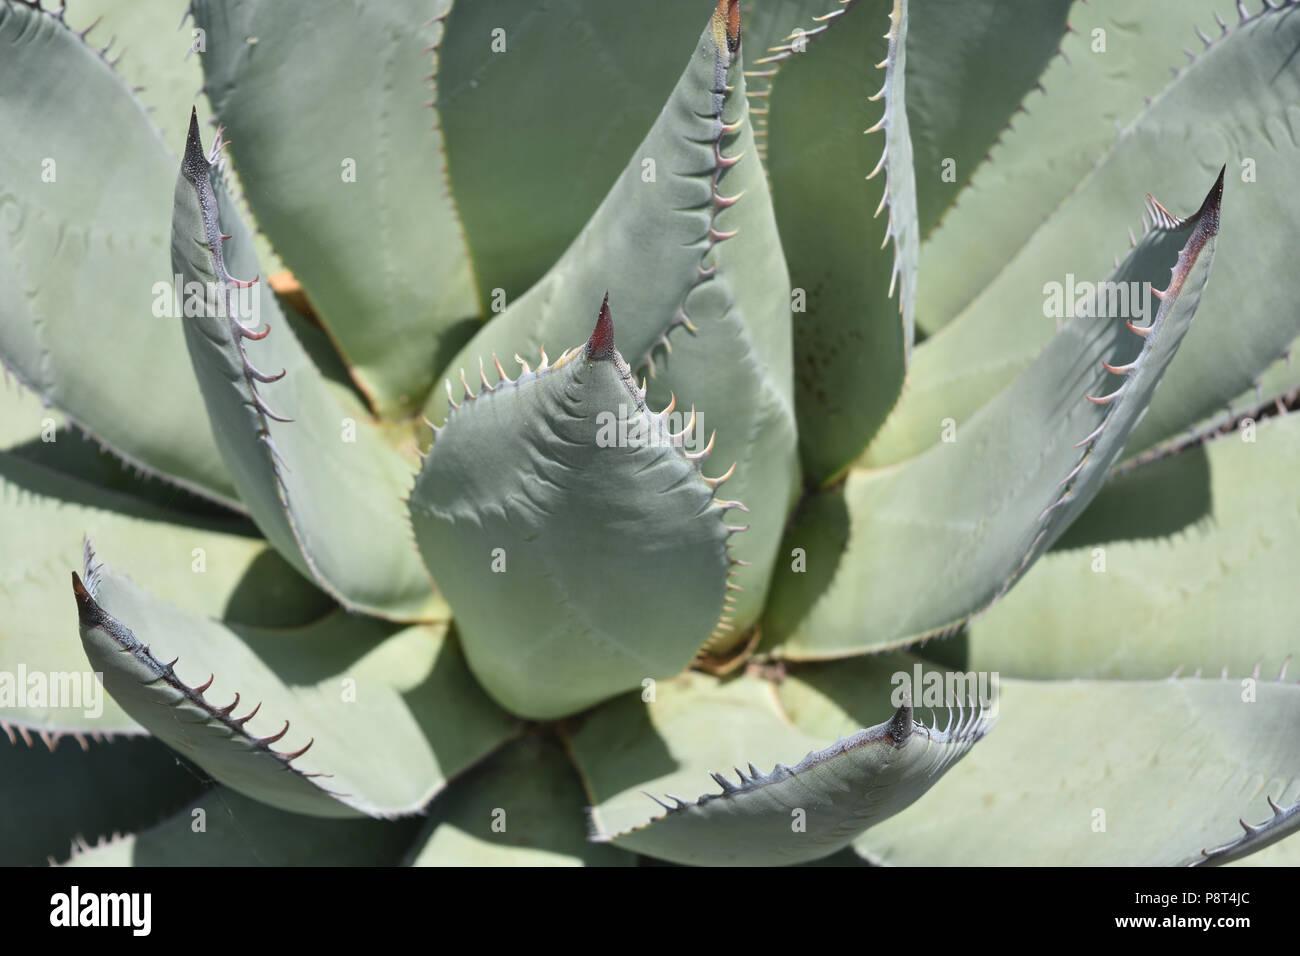 Up Close Look At A Very Healthy Aloe Vera Plant Stock Photo Alamy